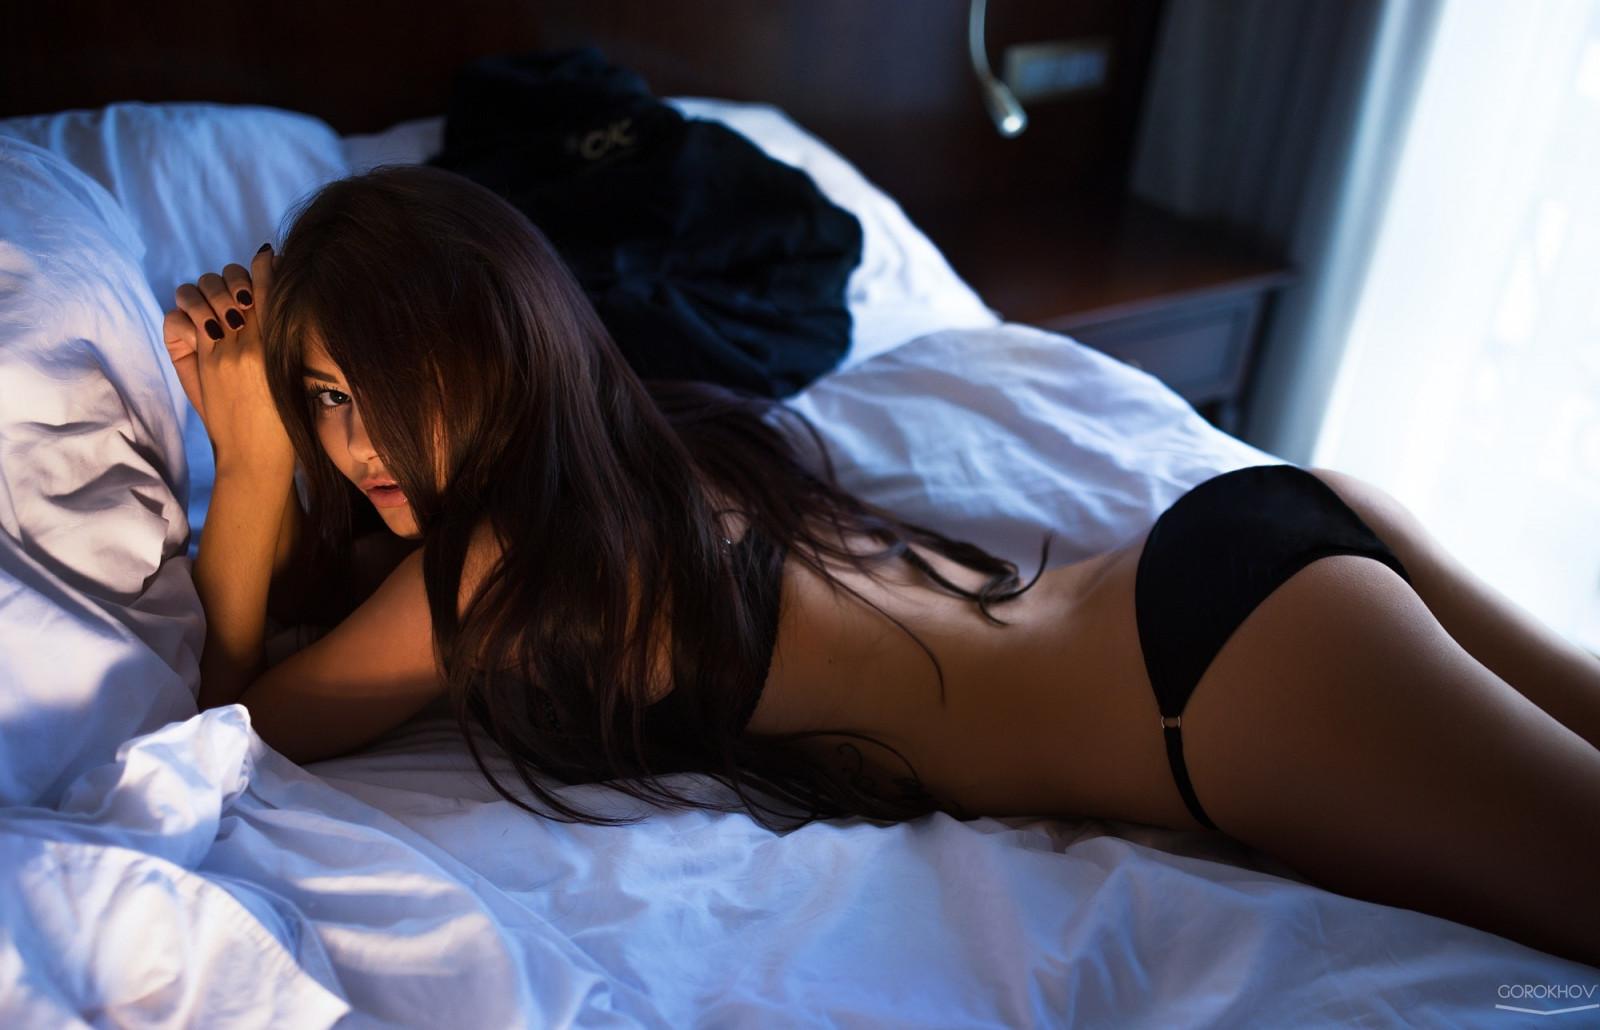 Секс девушки спинкой кровати мне